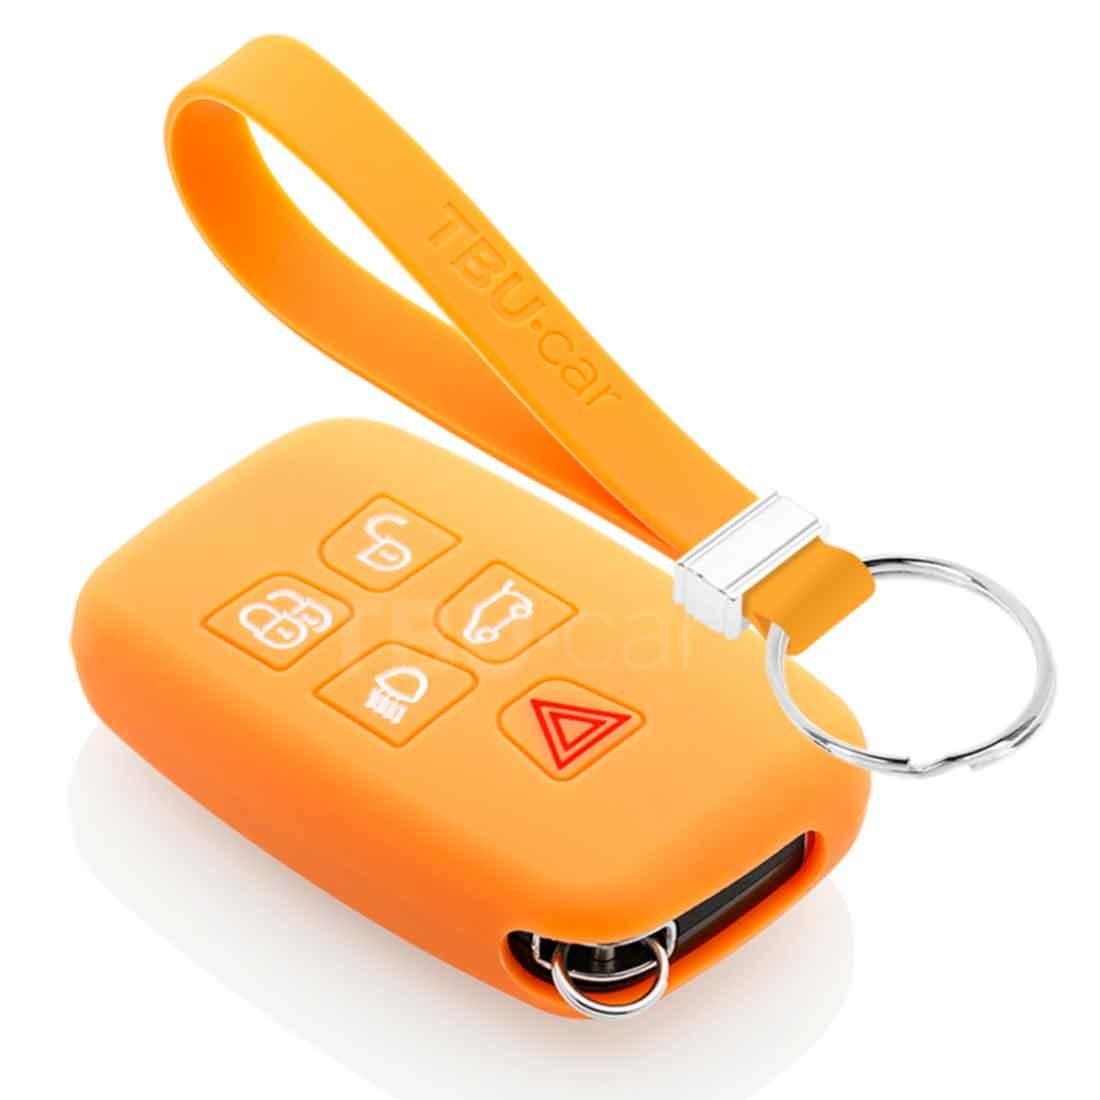 TBU car TBU car Autoschlüssel Hülle kompatibel mit Land Rover 5 Tasten (Keyless Entry) - Schutzhülle aus Silikon - Auto Schlüsselhülle Cover in Orange